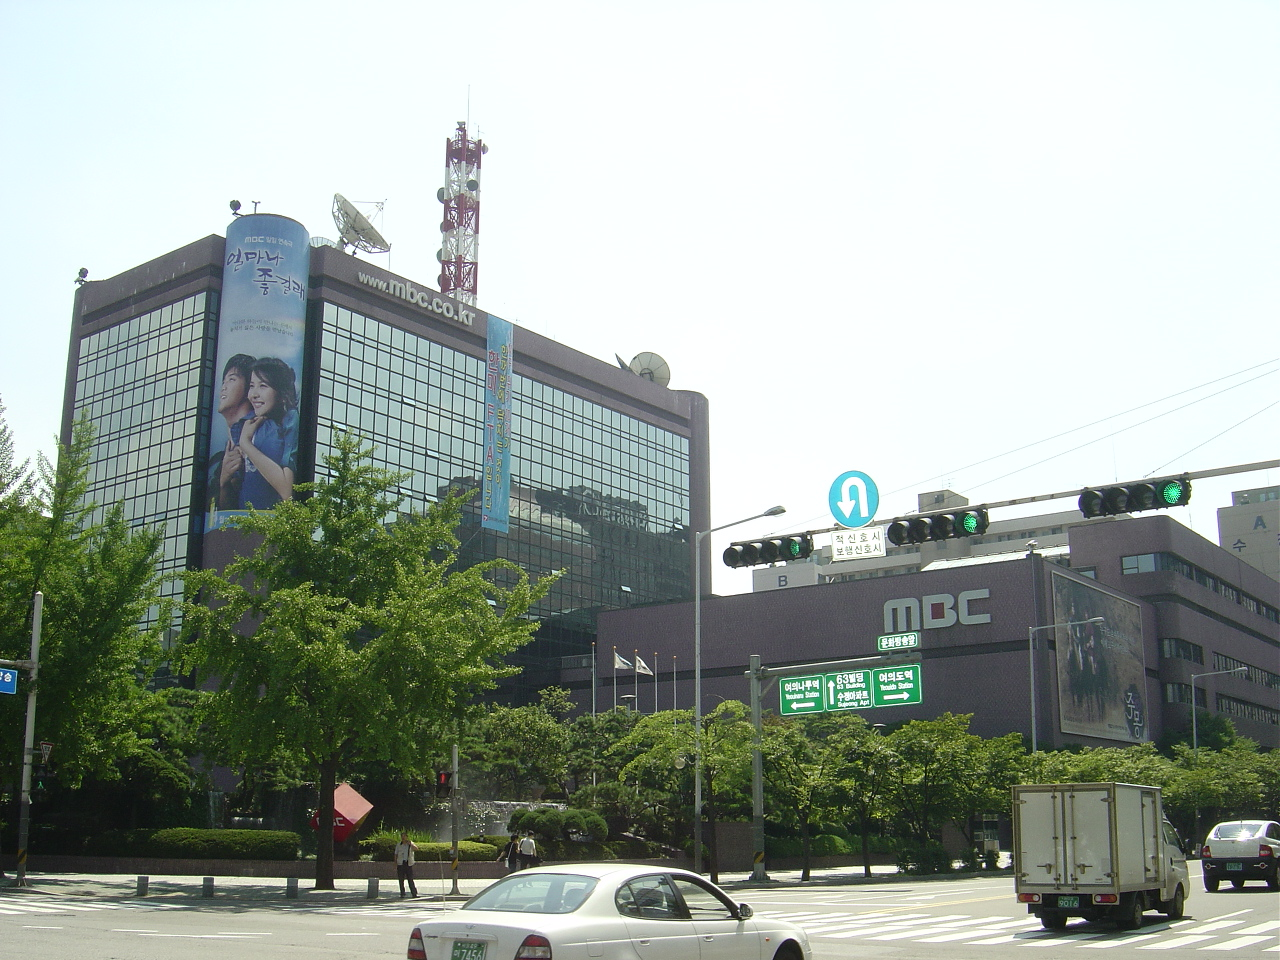 File:MBC headquarter buld.jpg - Wikimedia Commons